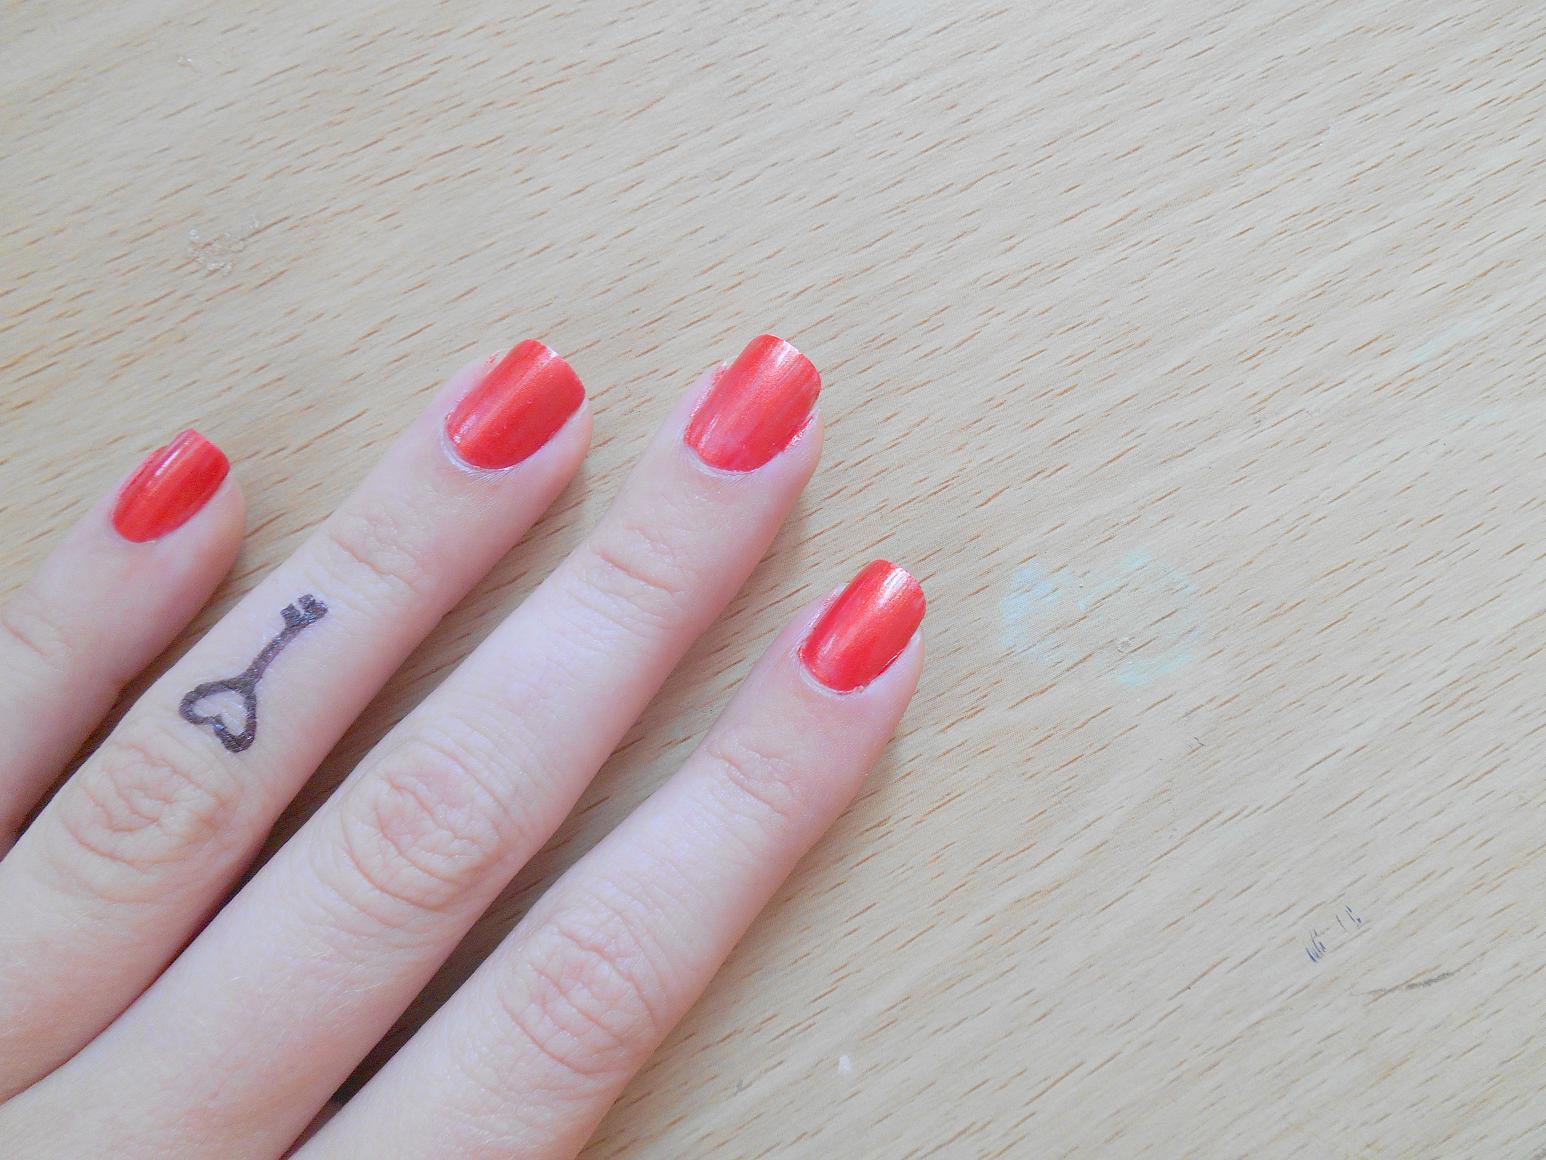 tattoos finger hand simple creative temporary joyenergizer